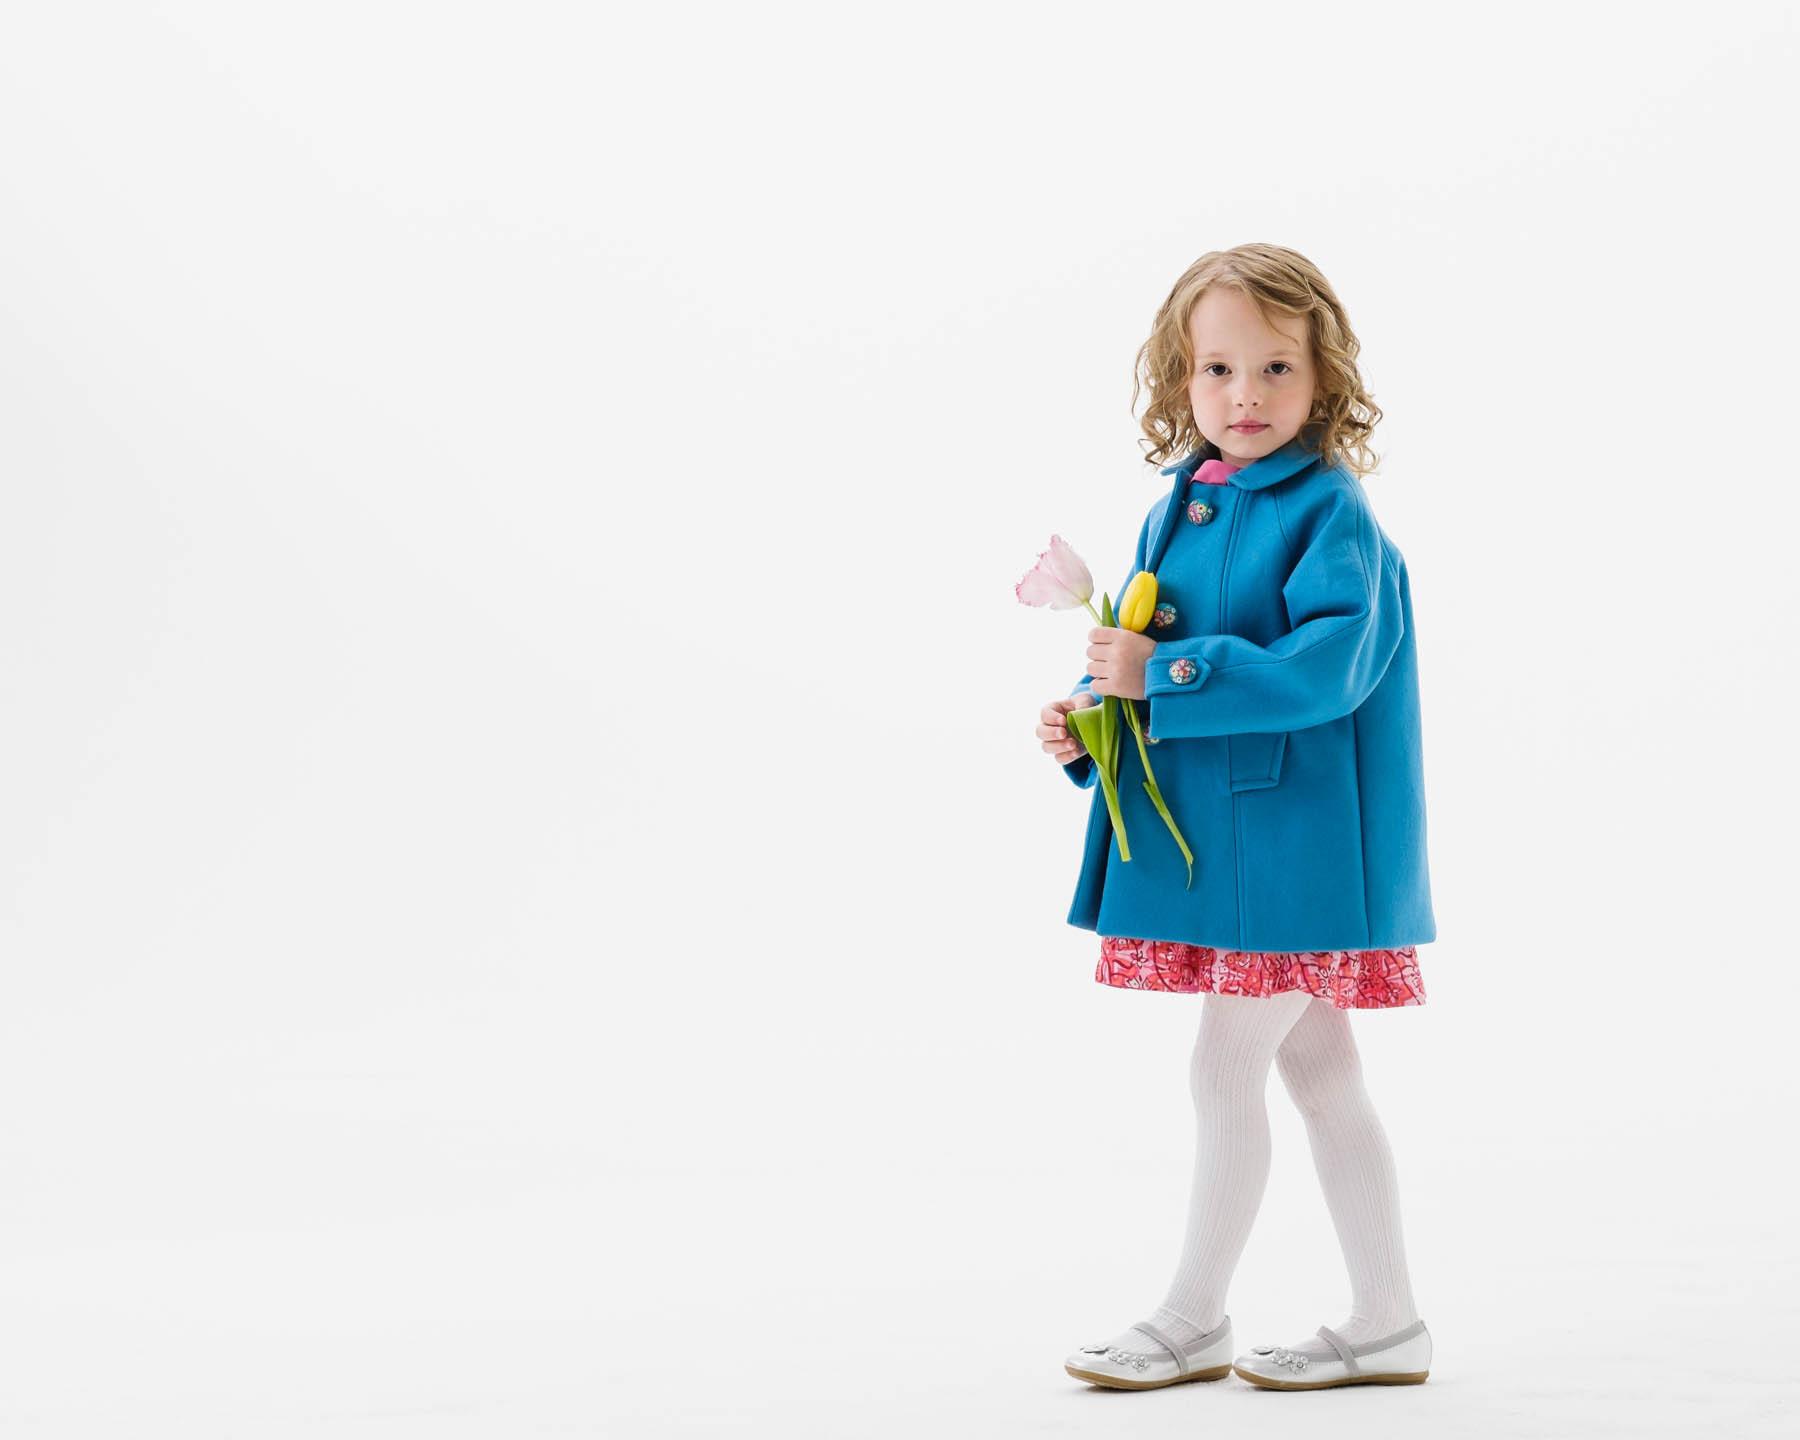 Littlegoodall-Spring2015-008.jpg